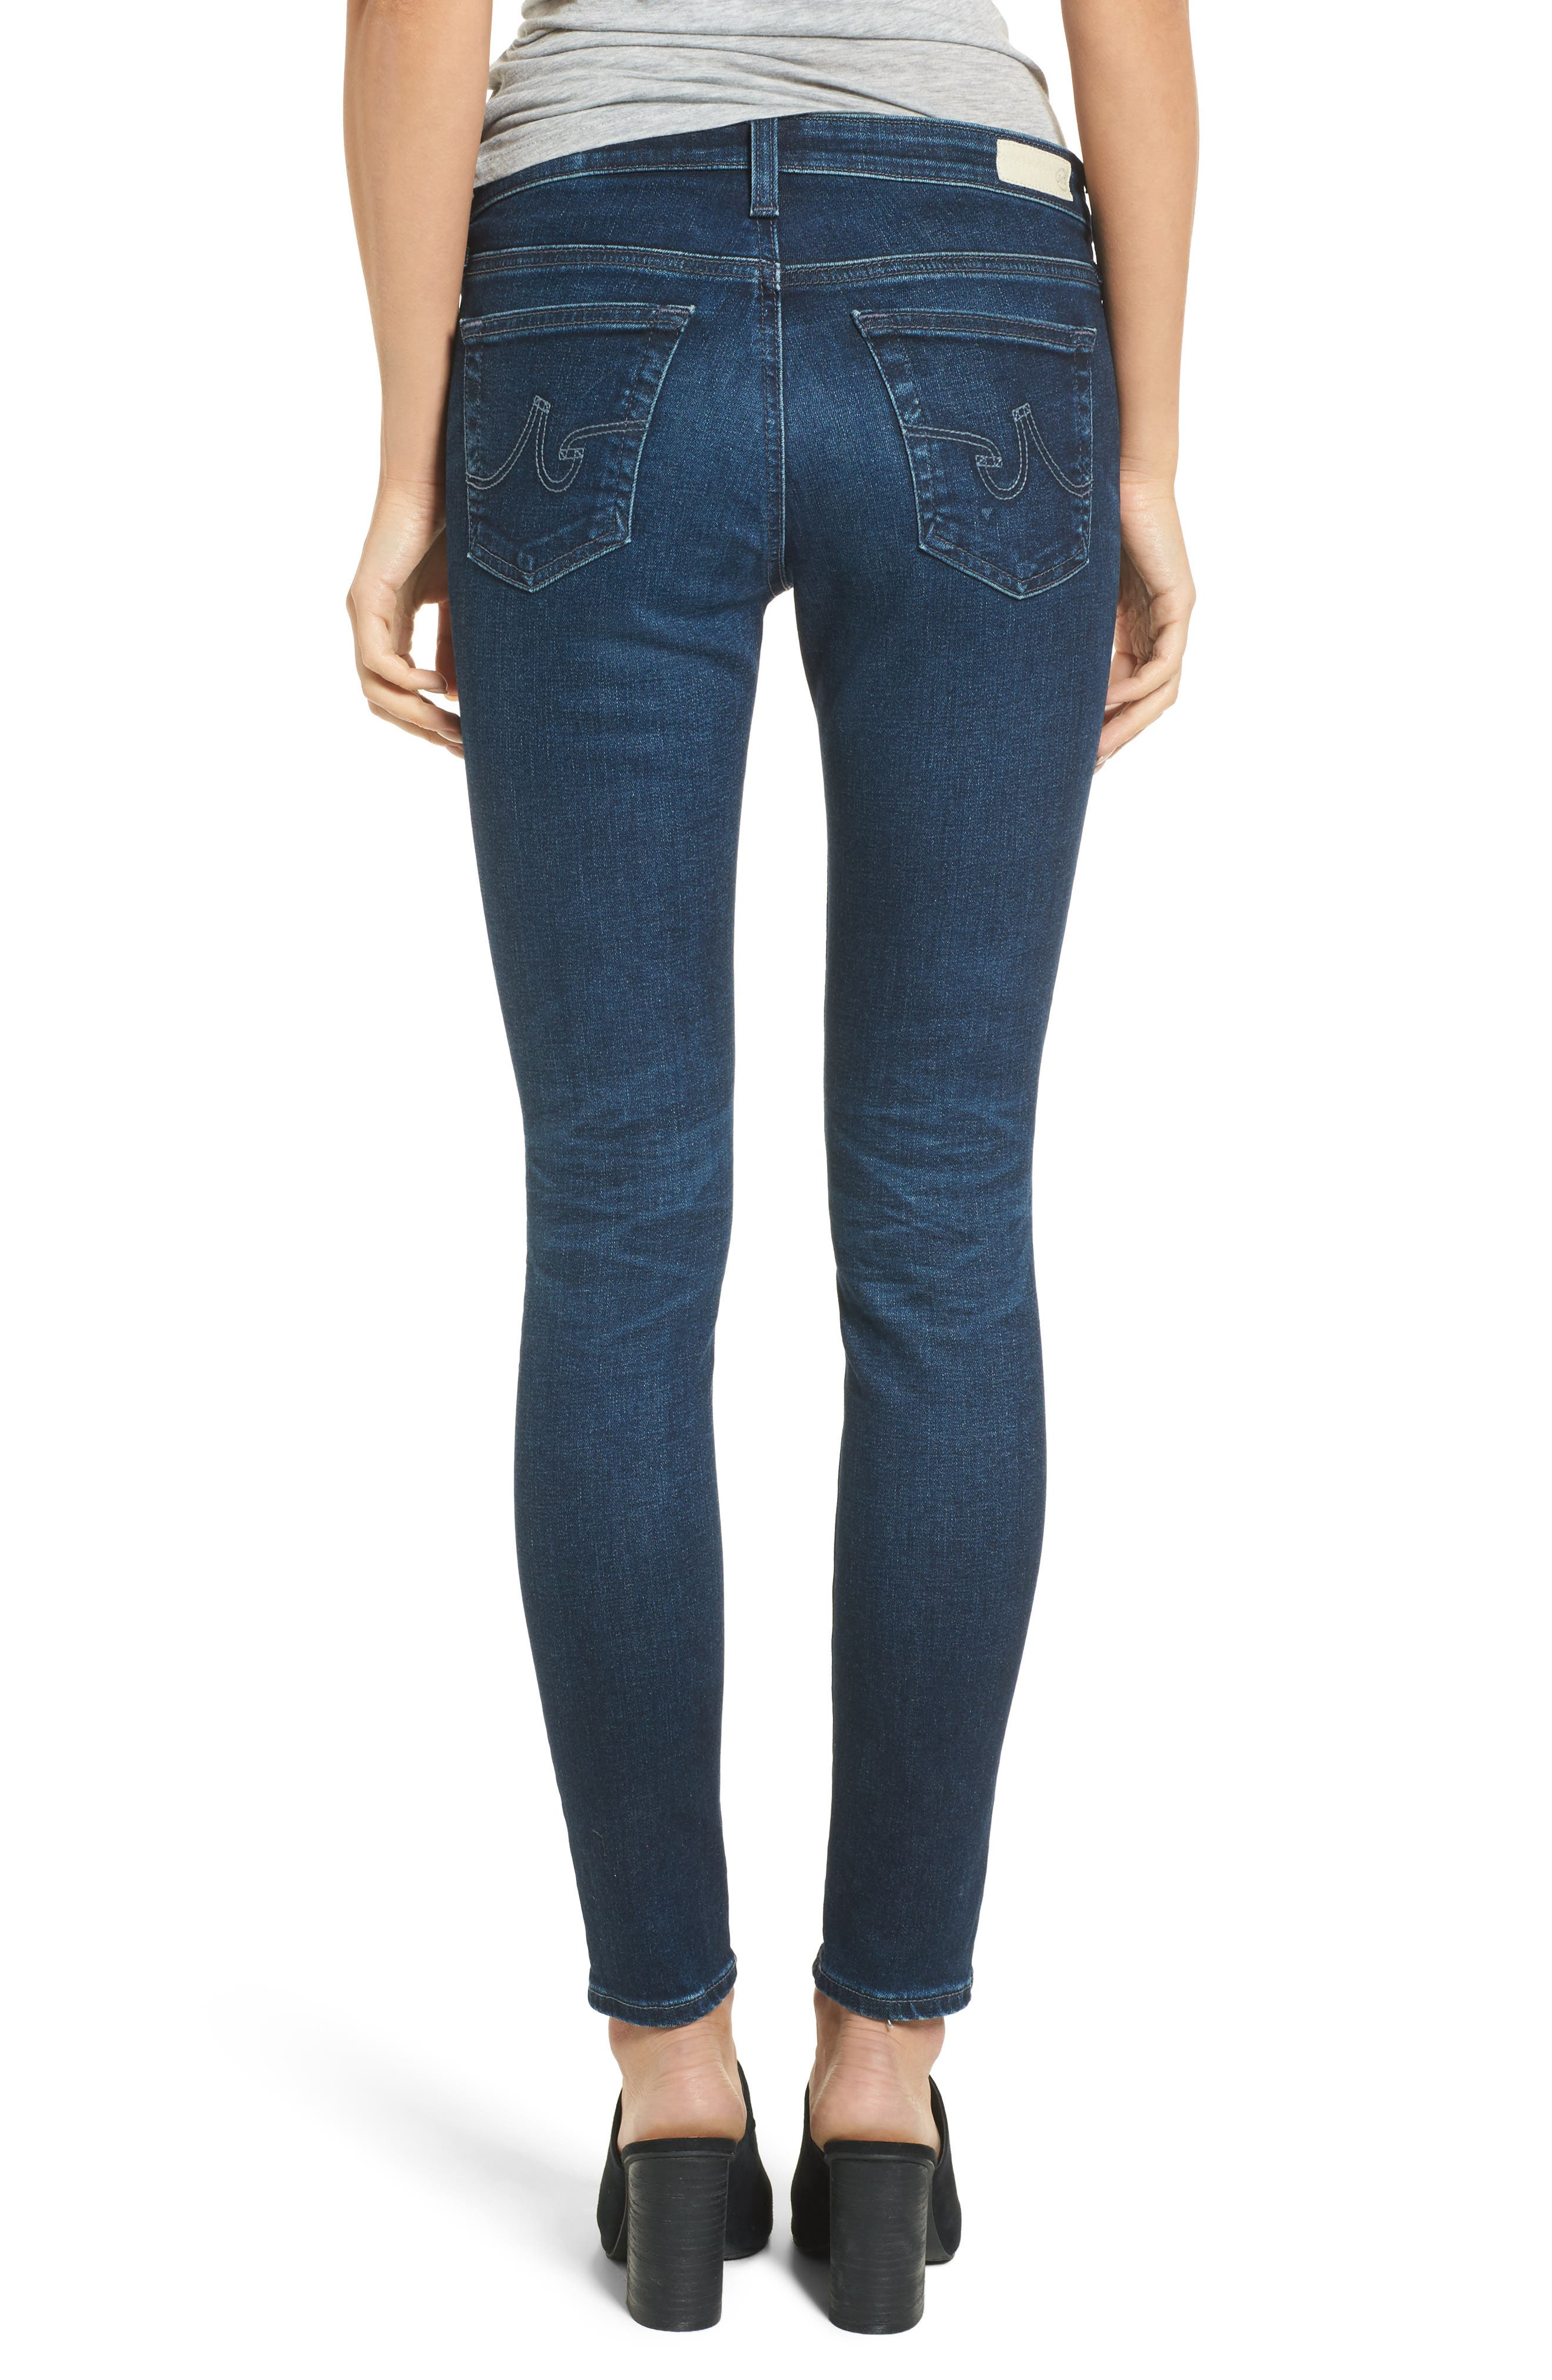 Alternate Image 2  - AG The Legging Ankle Super Skinny Jeans (04 Years Rapid)